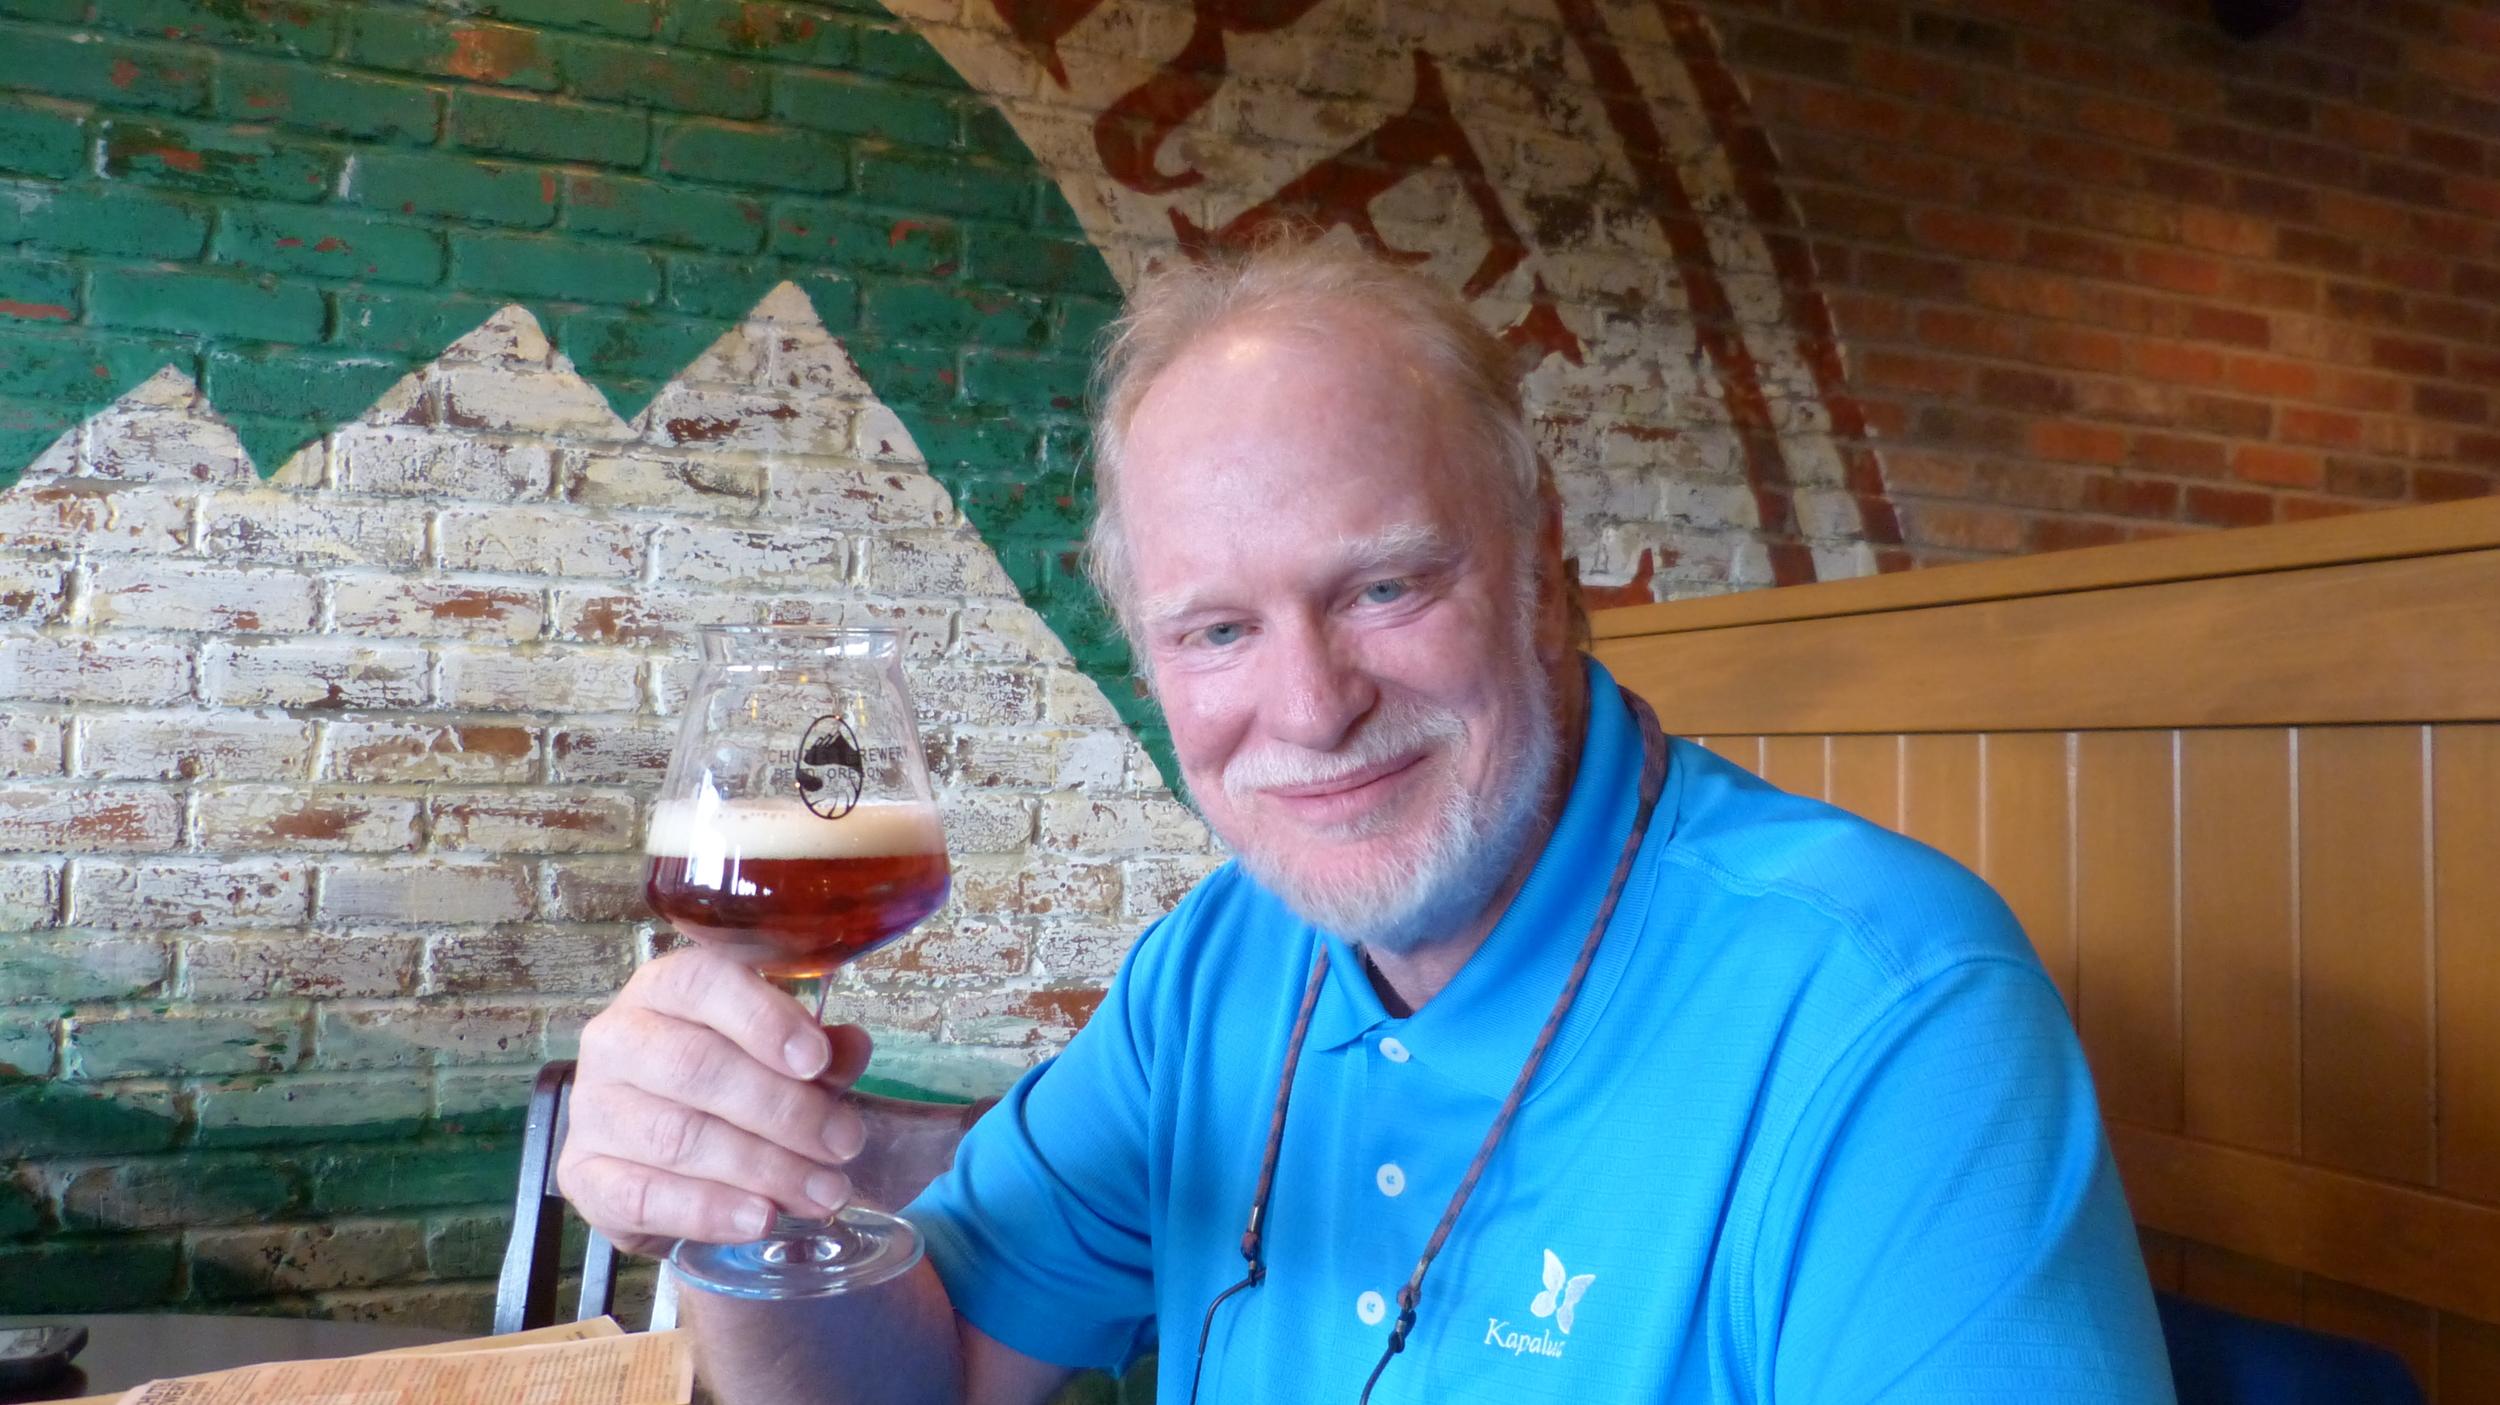 Golf & Beer Writer Tom Bedell at Deschultz Brewery in Bend, Oregon